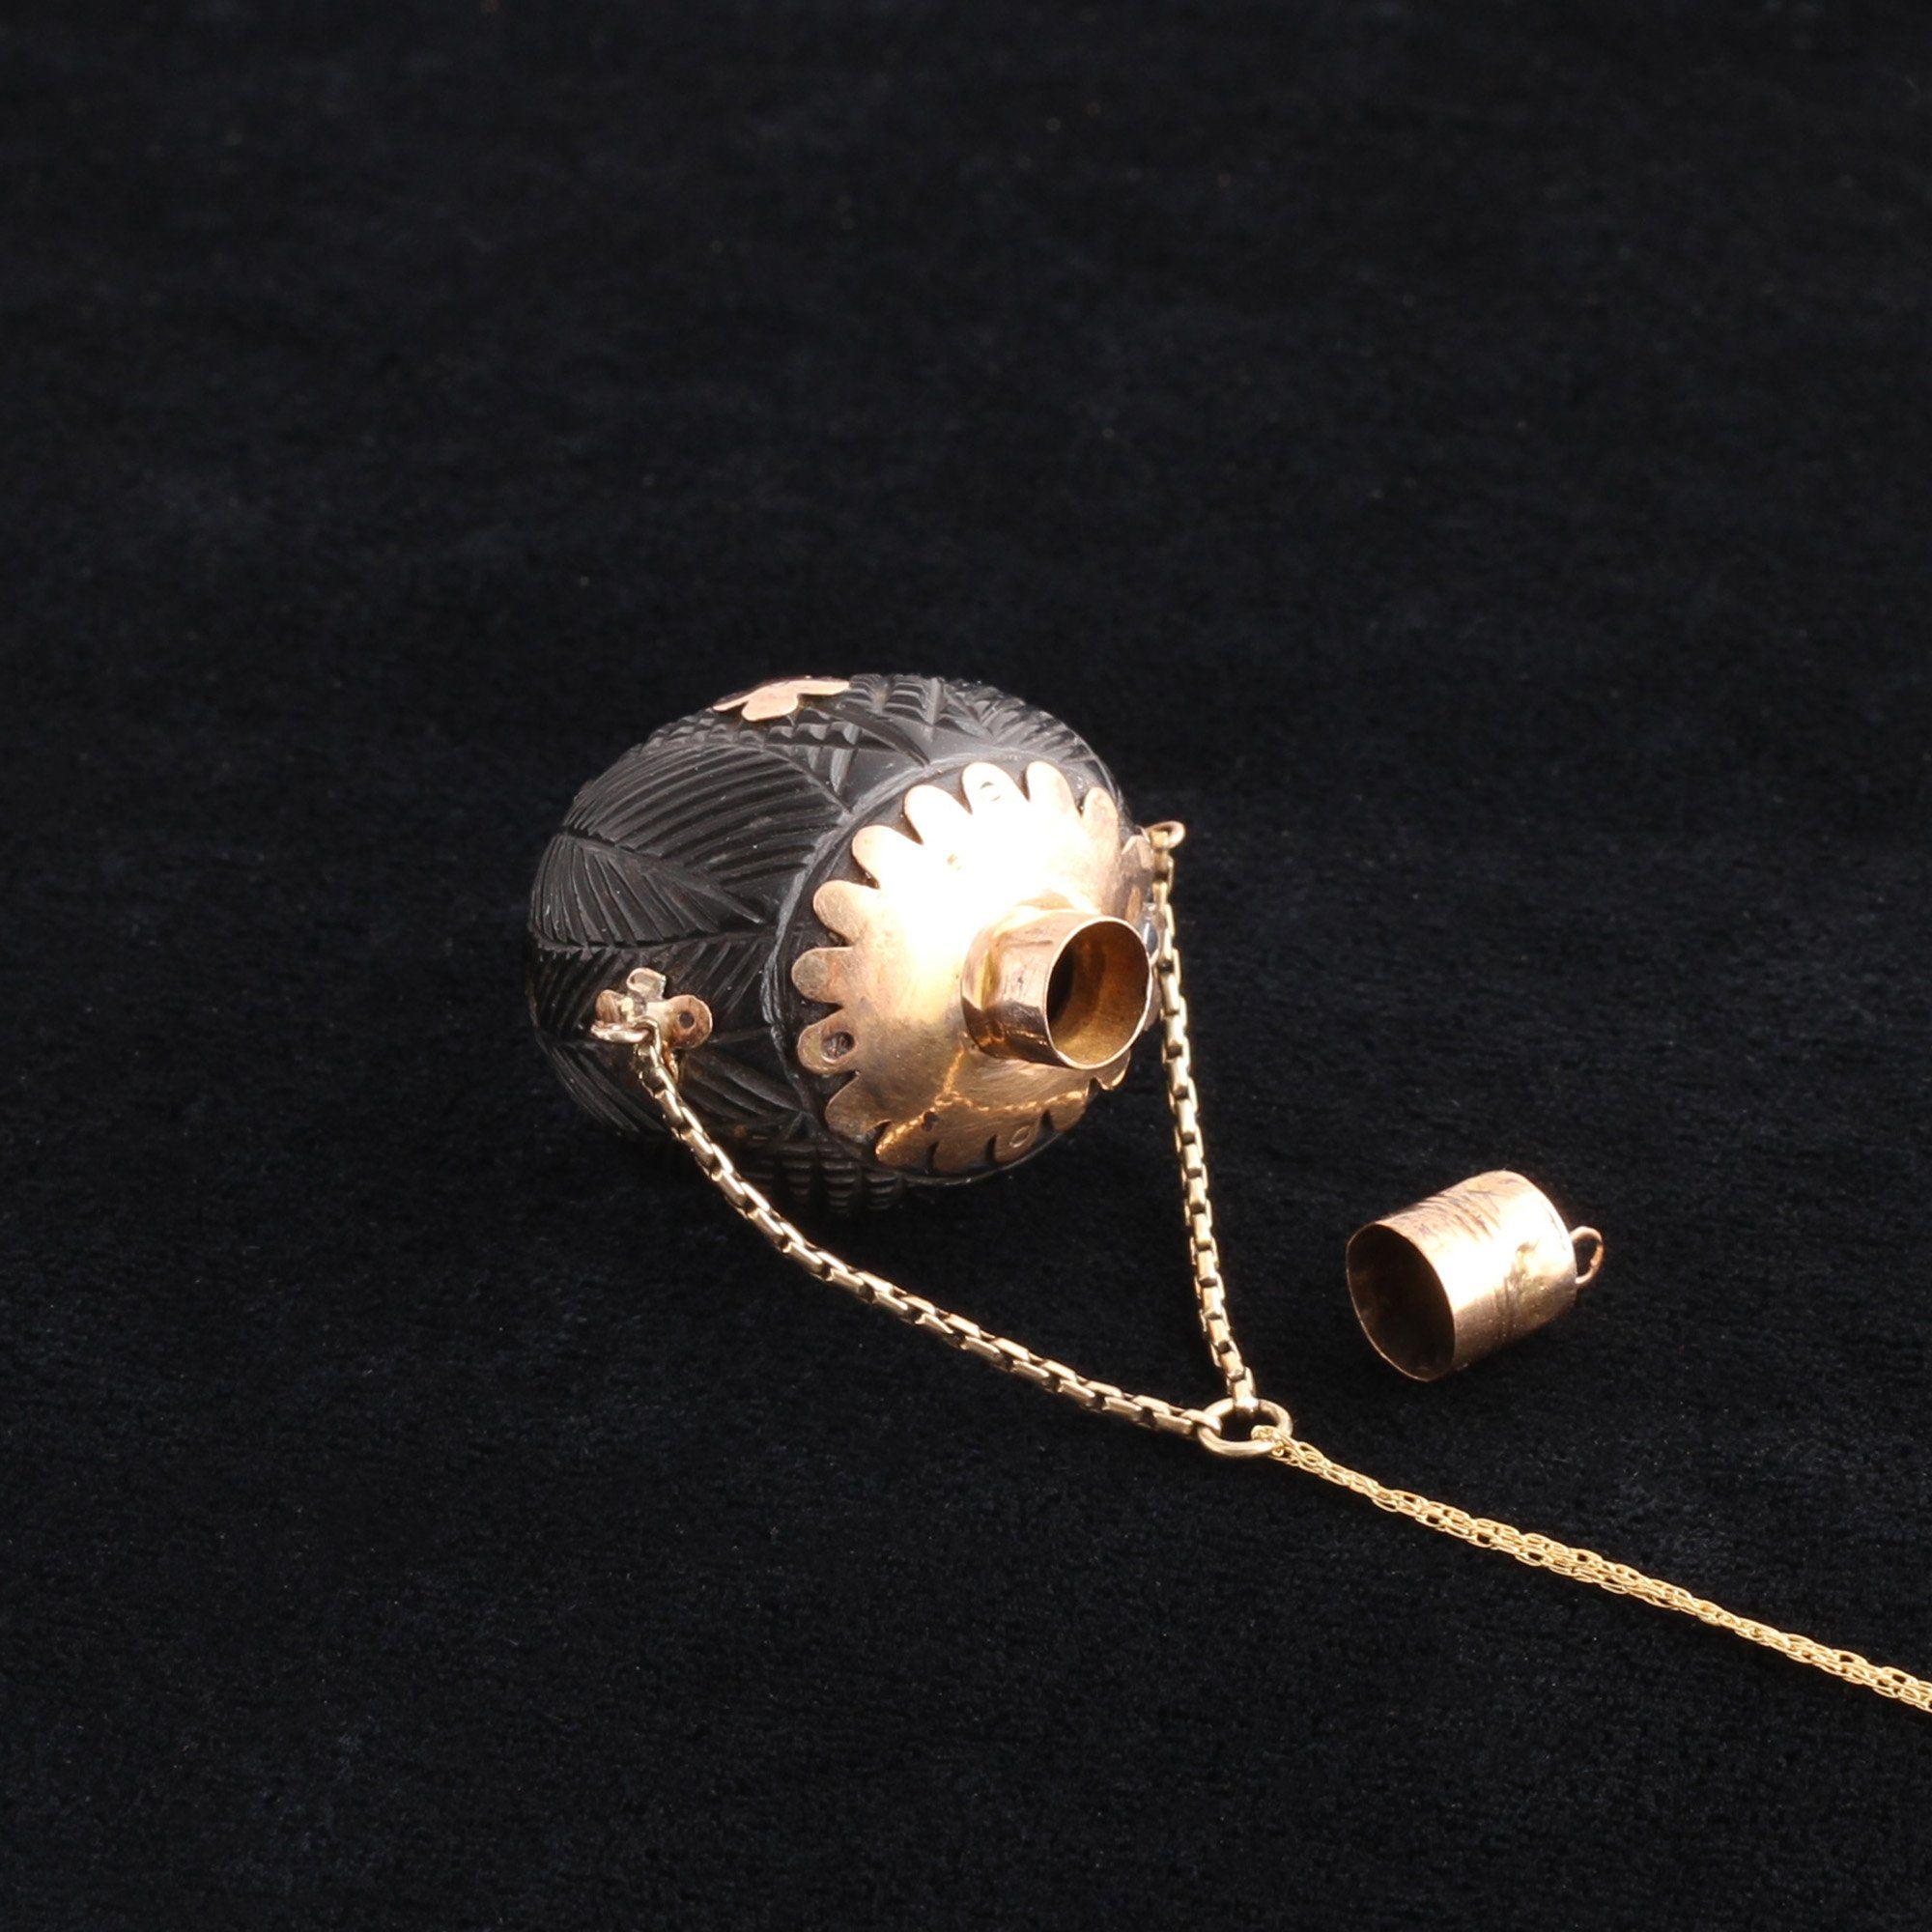 Victorian Sea Bean Scent Bottle Necklace